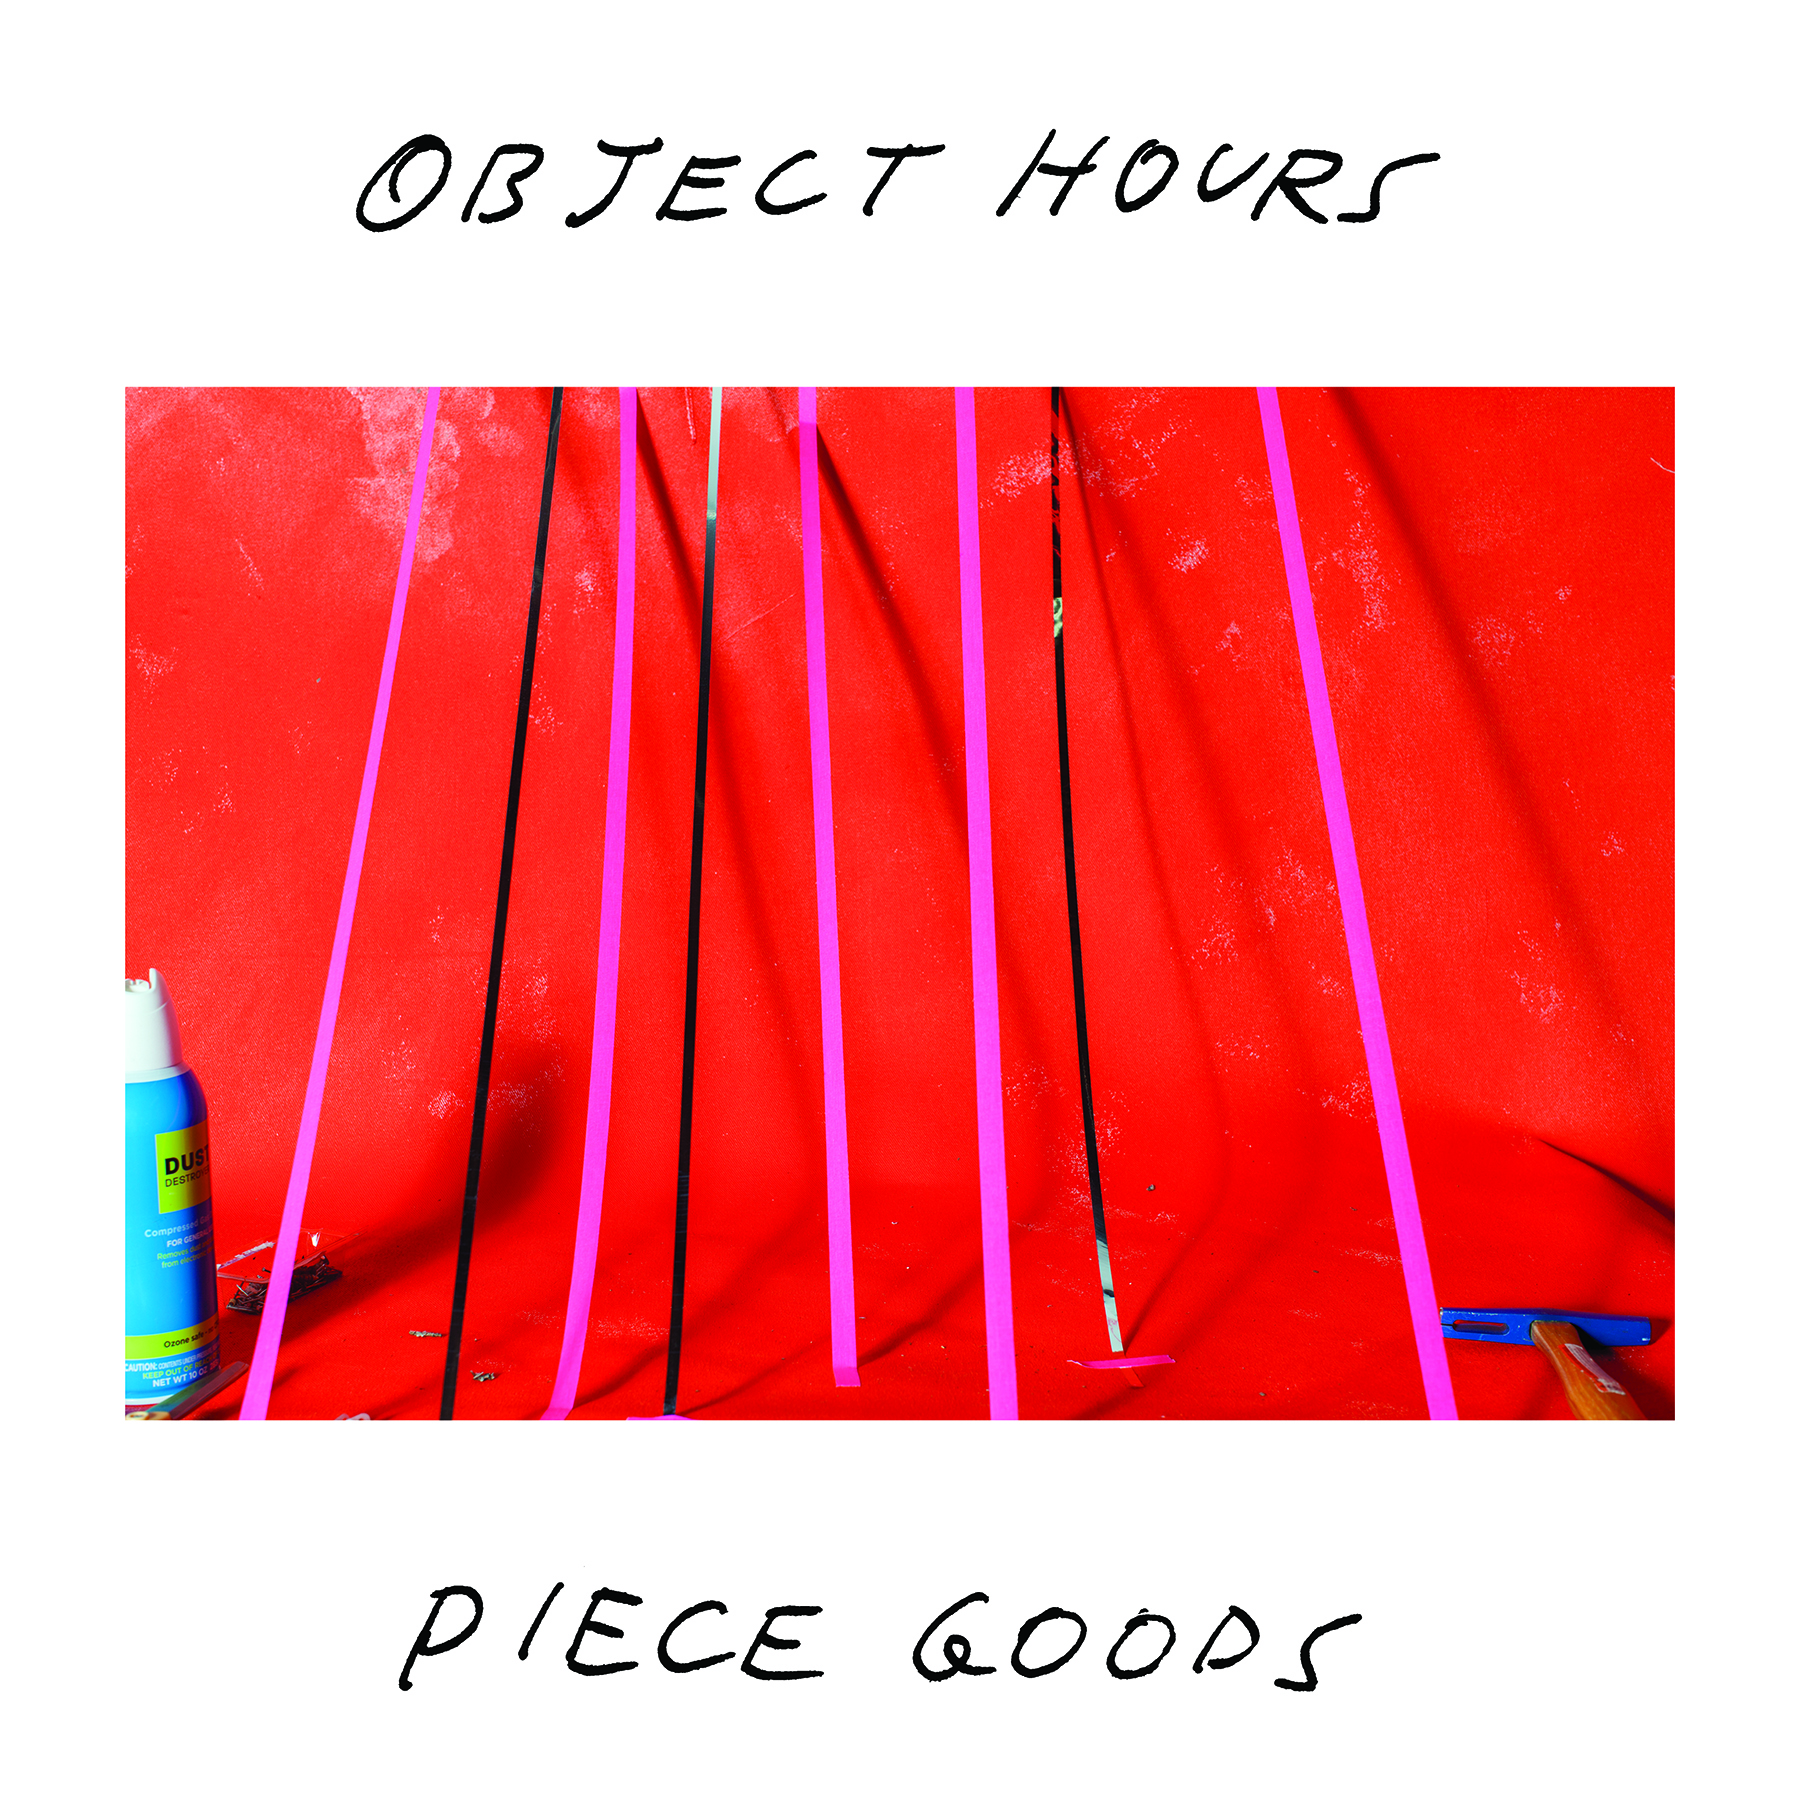 Piece Goods